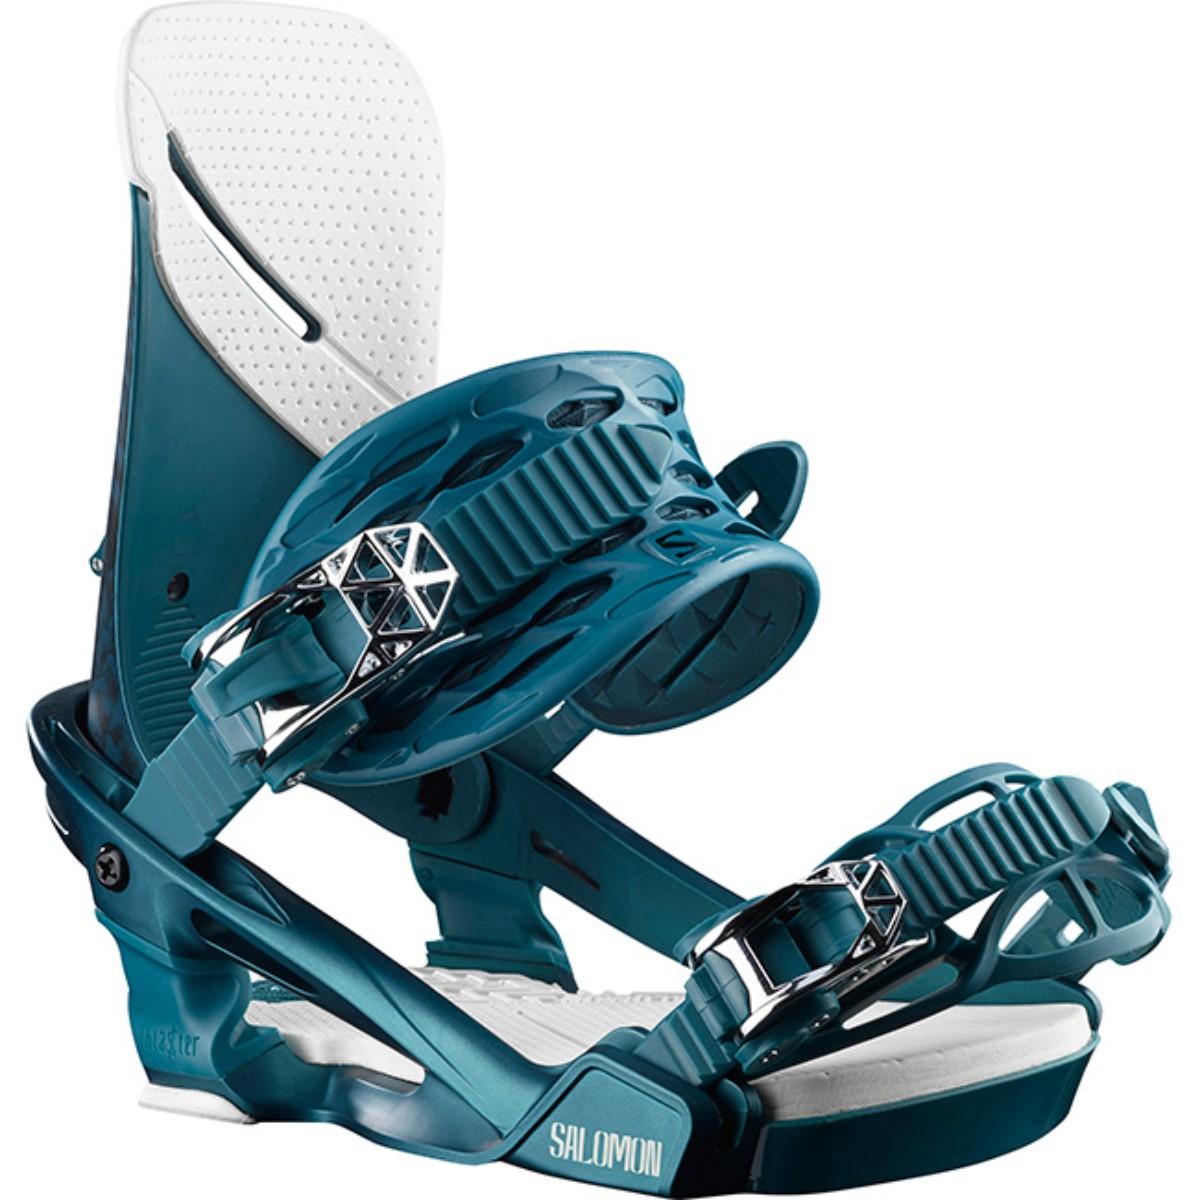 Salomon Nova Womens Snowboard Bindings